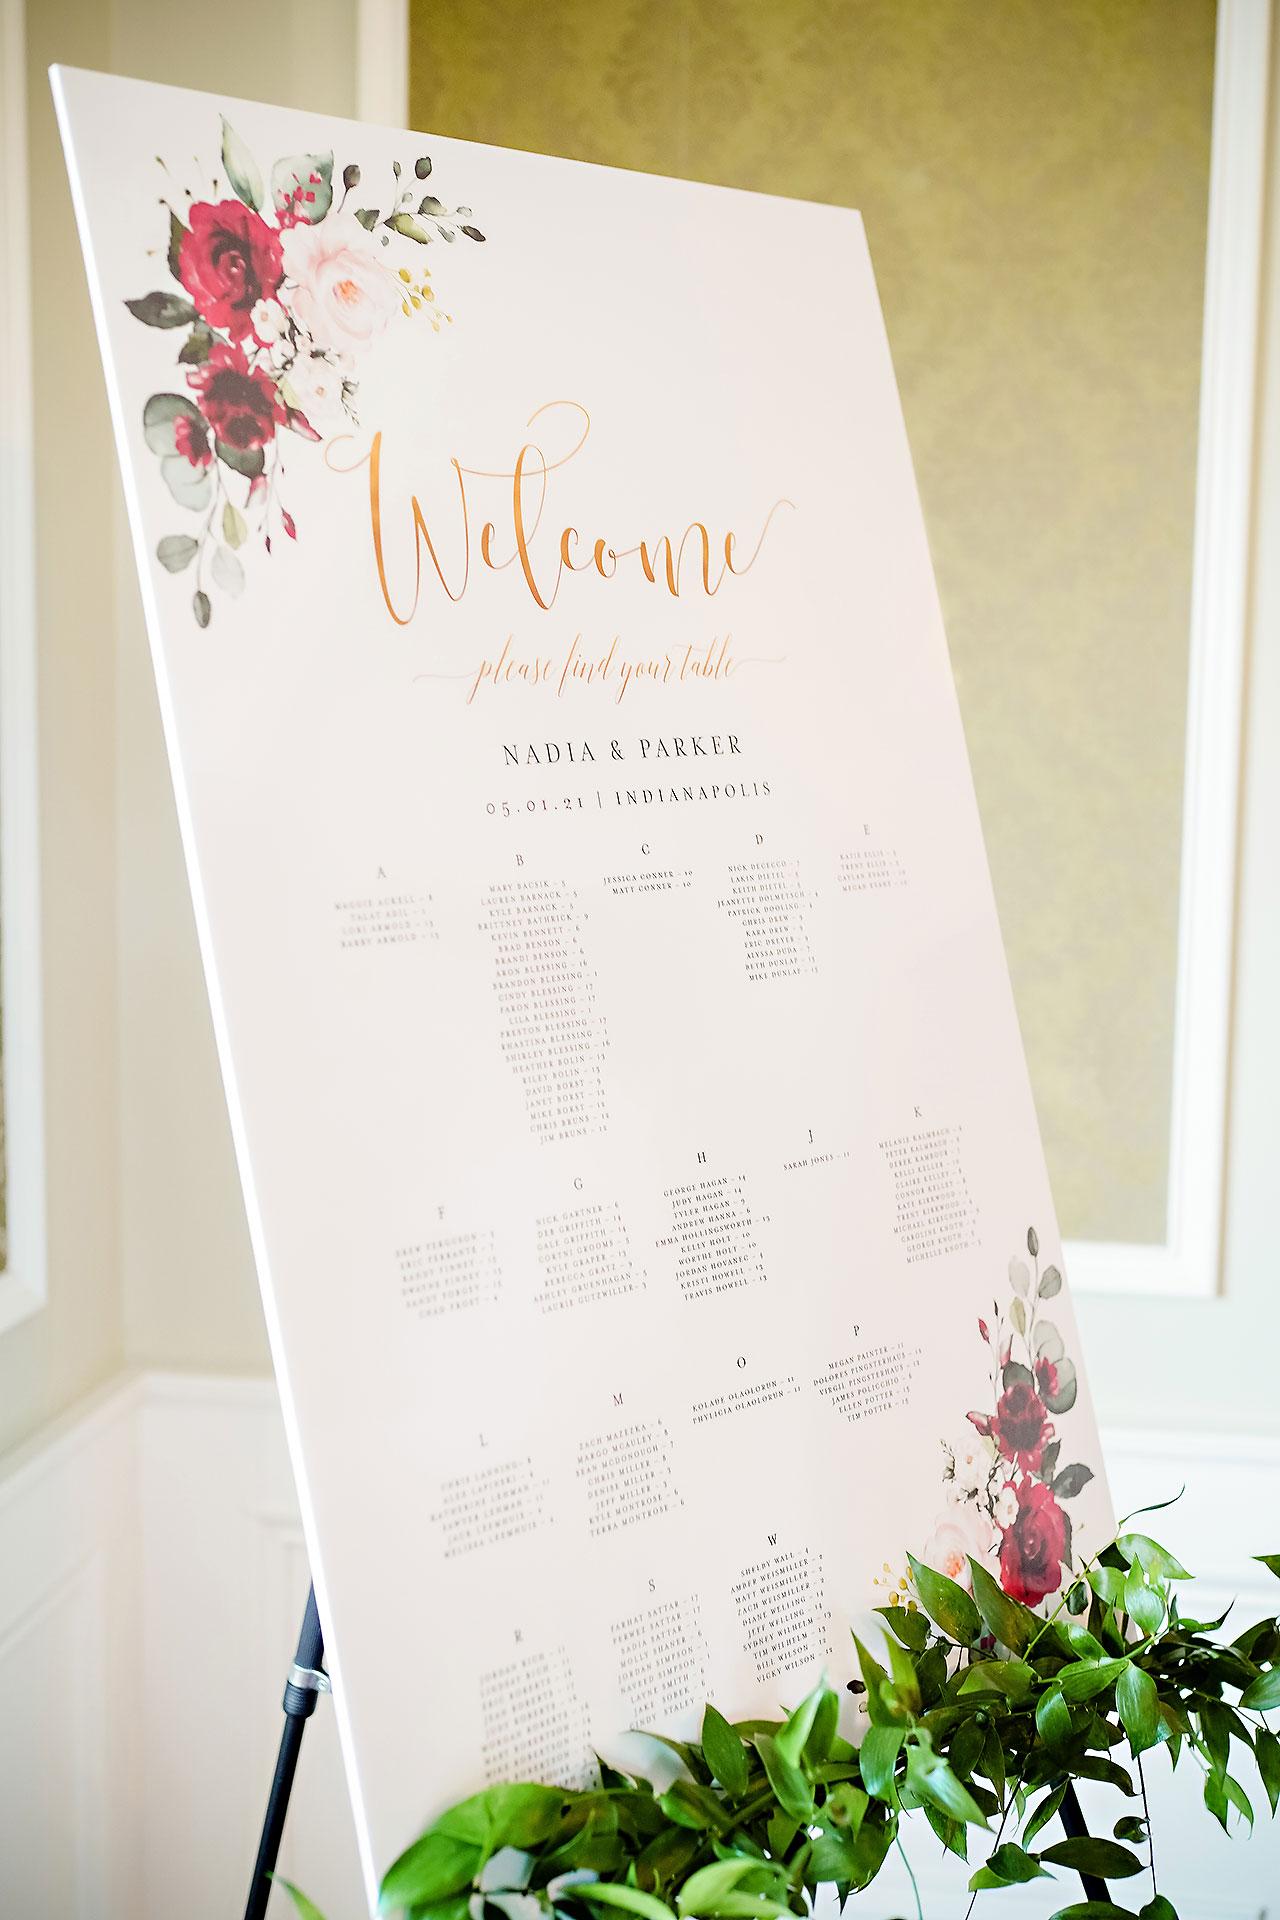 Nadia Parker Black Iris Estate Carmel Indiana Wedding May 2021 218